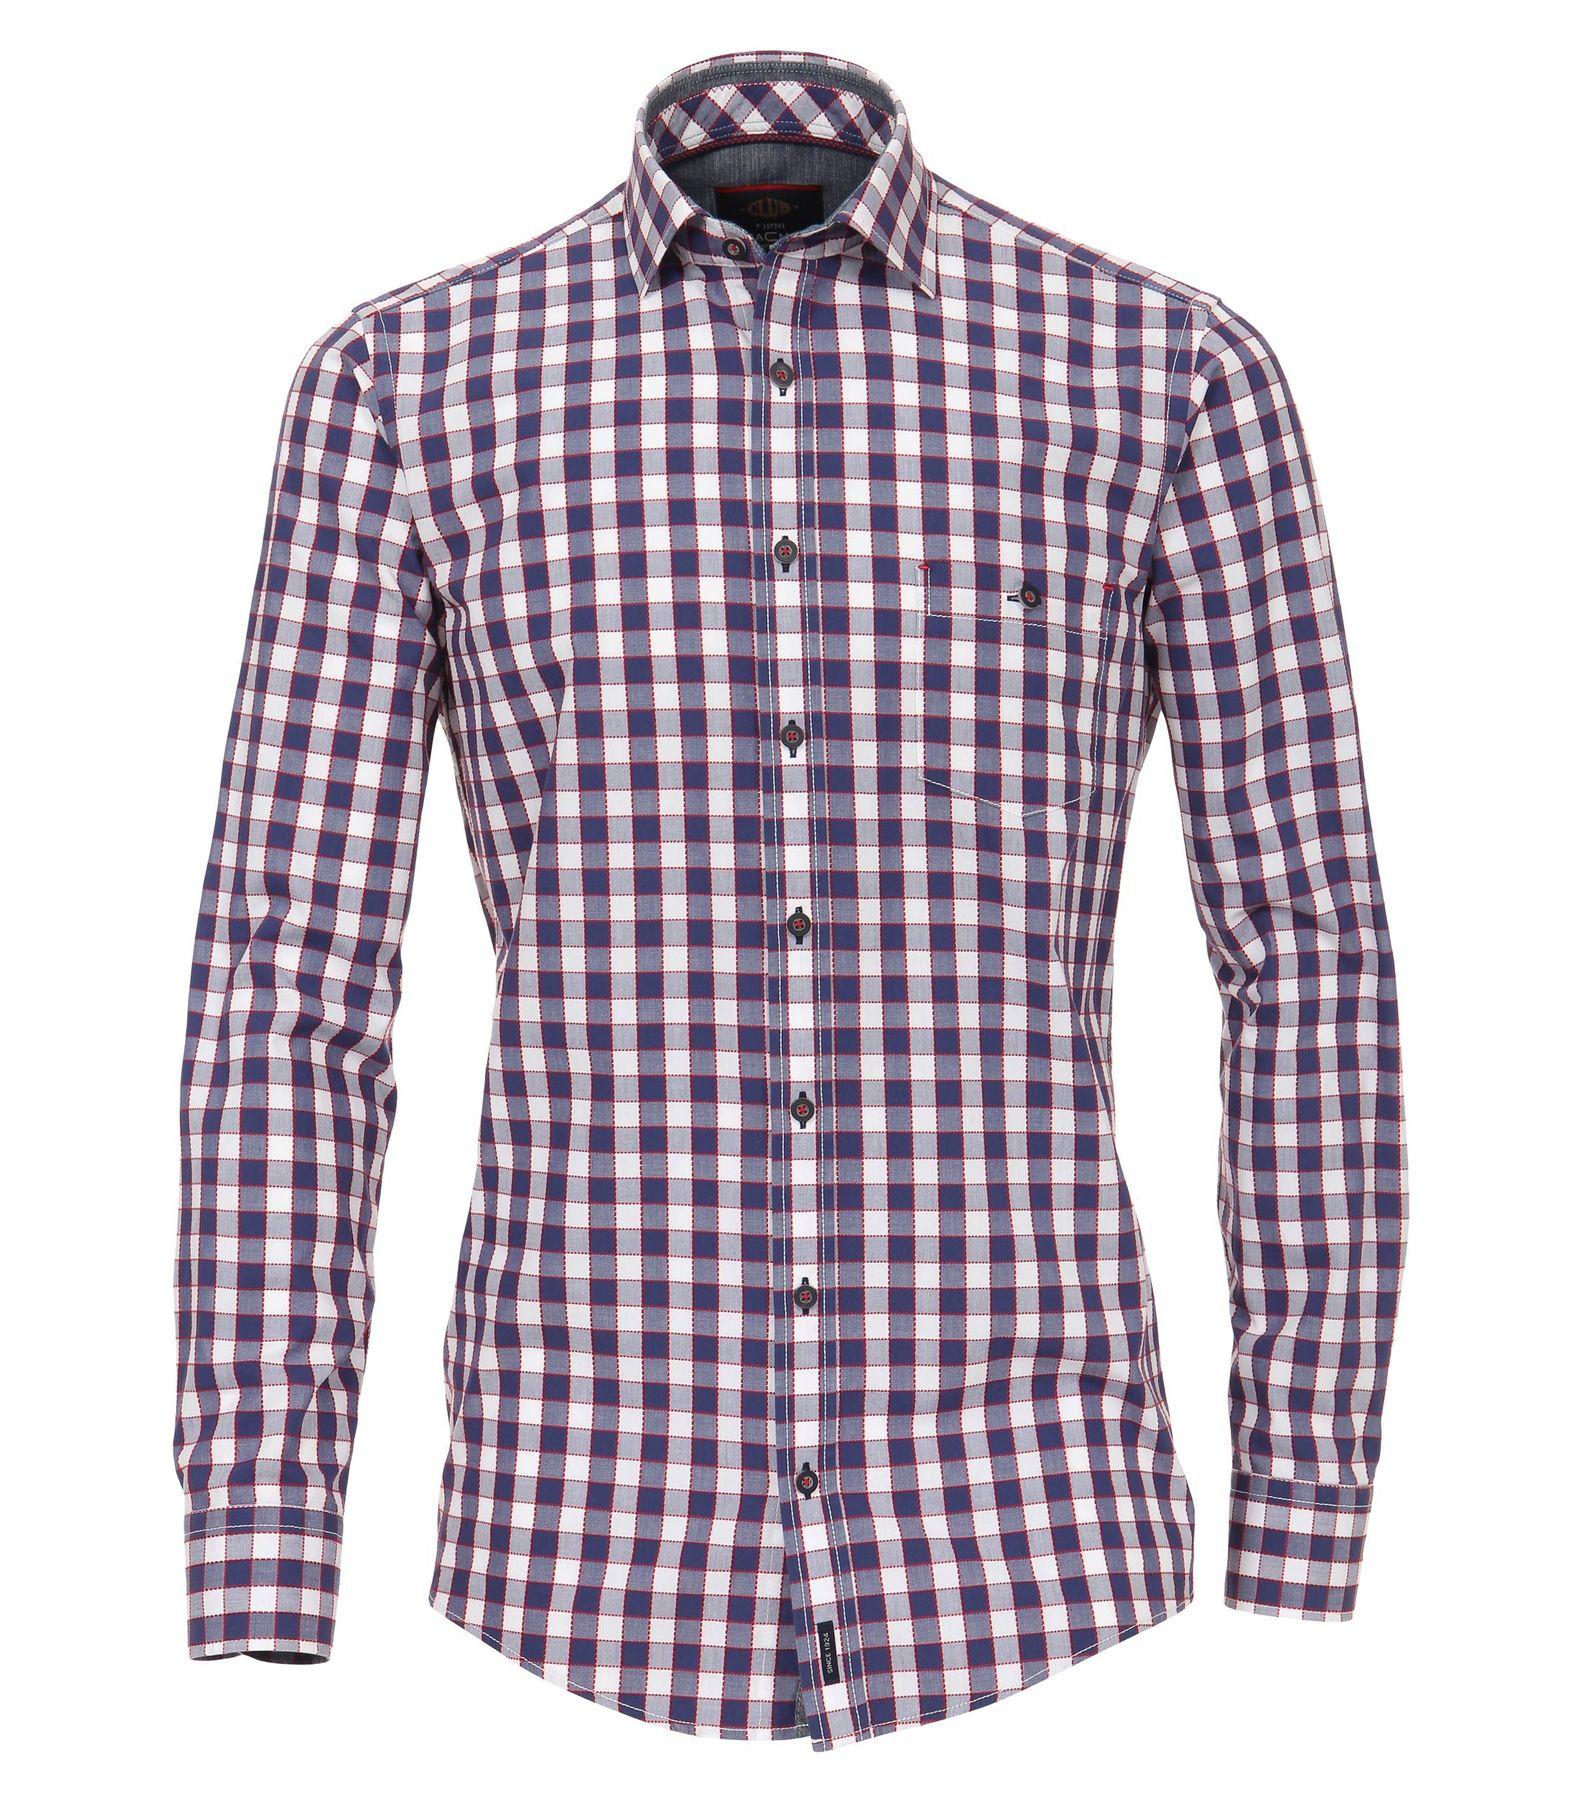 Casa Moda - Casual Fit - Fancy Herren Hemd kariert mit Kent-Kragen in blau (482900600)